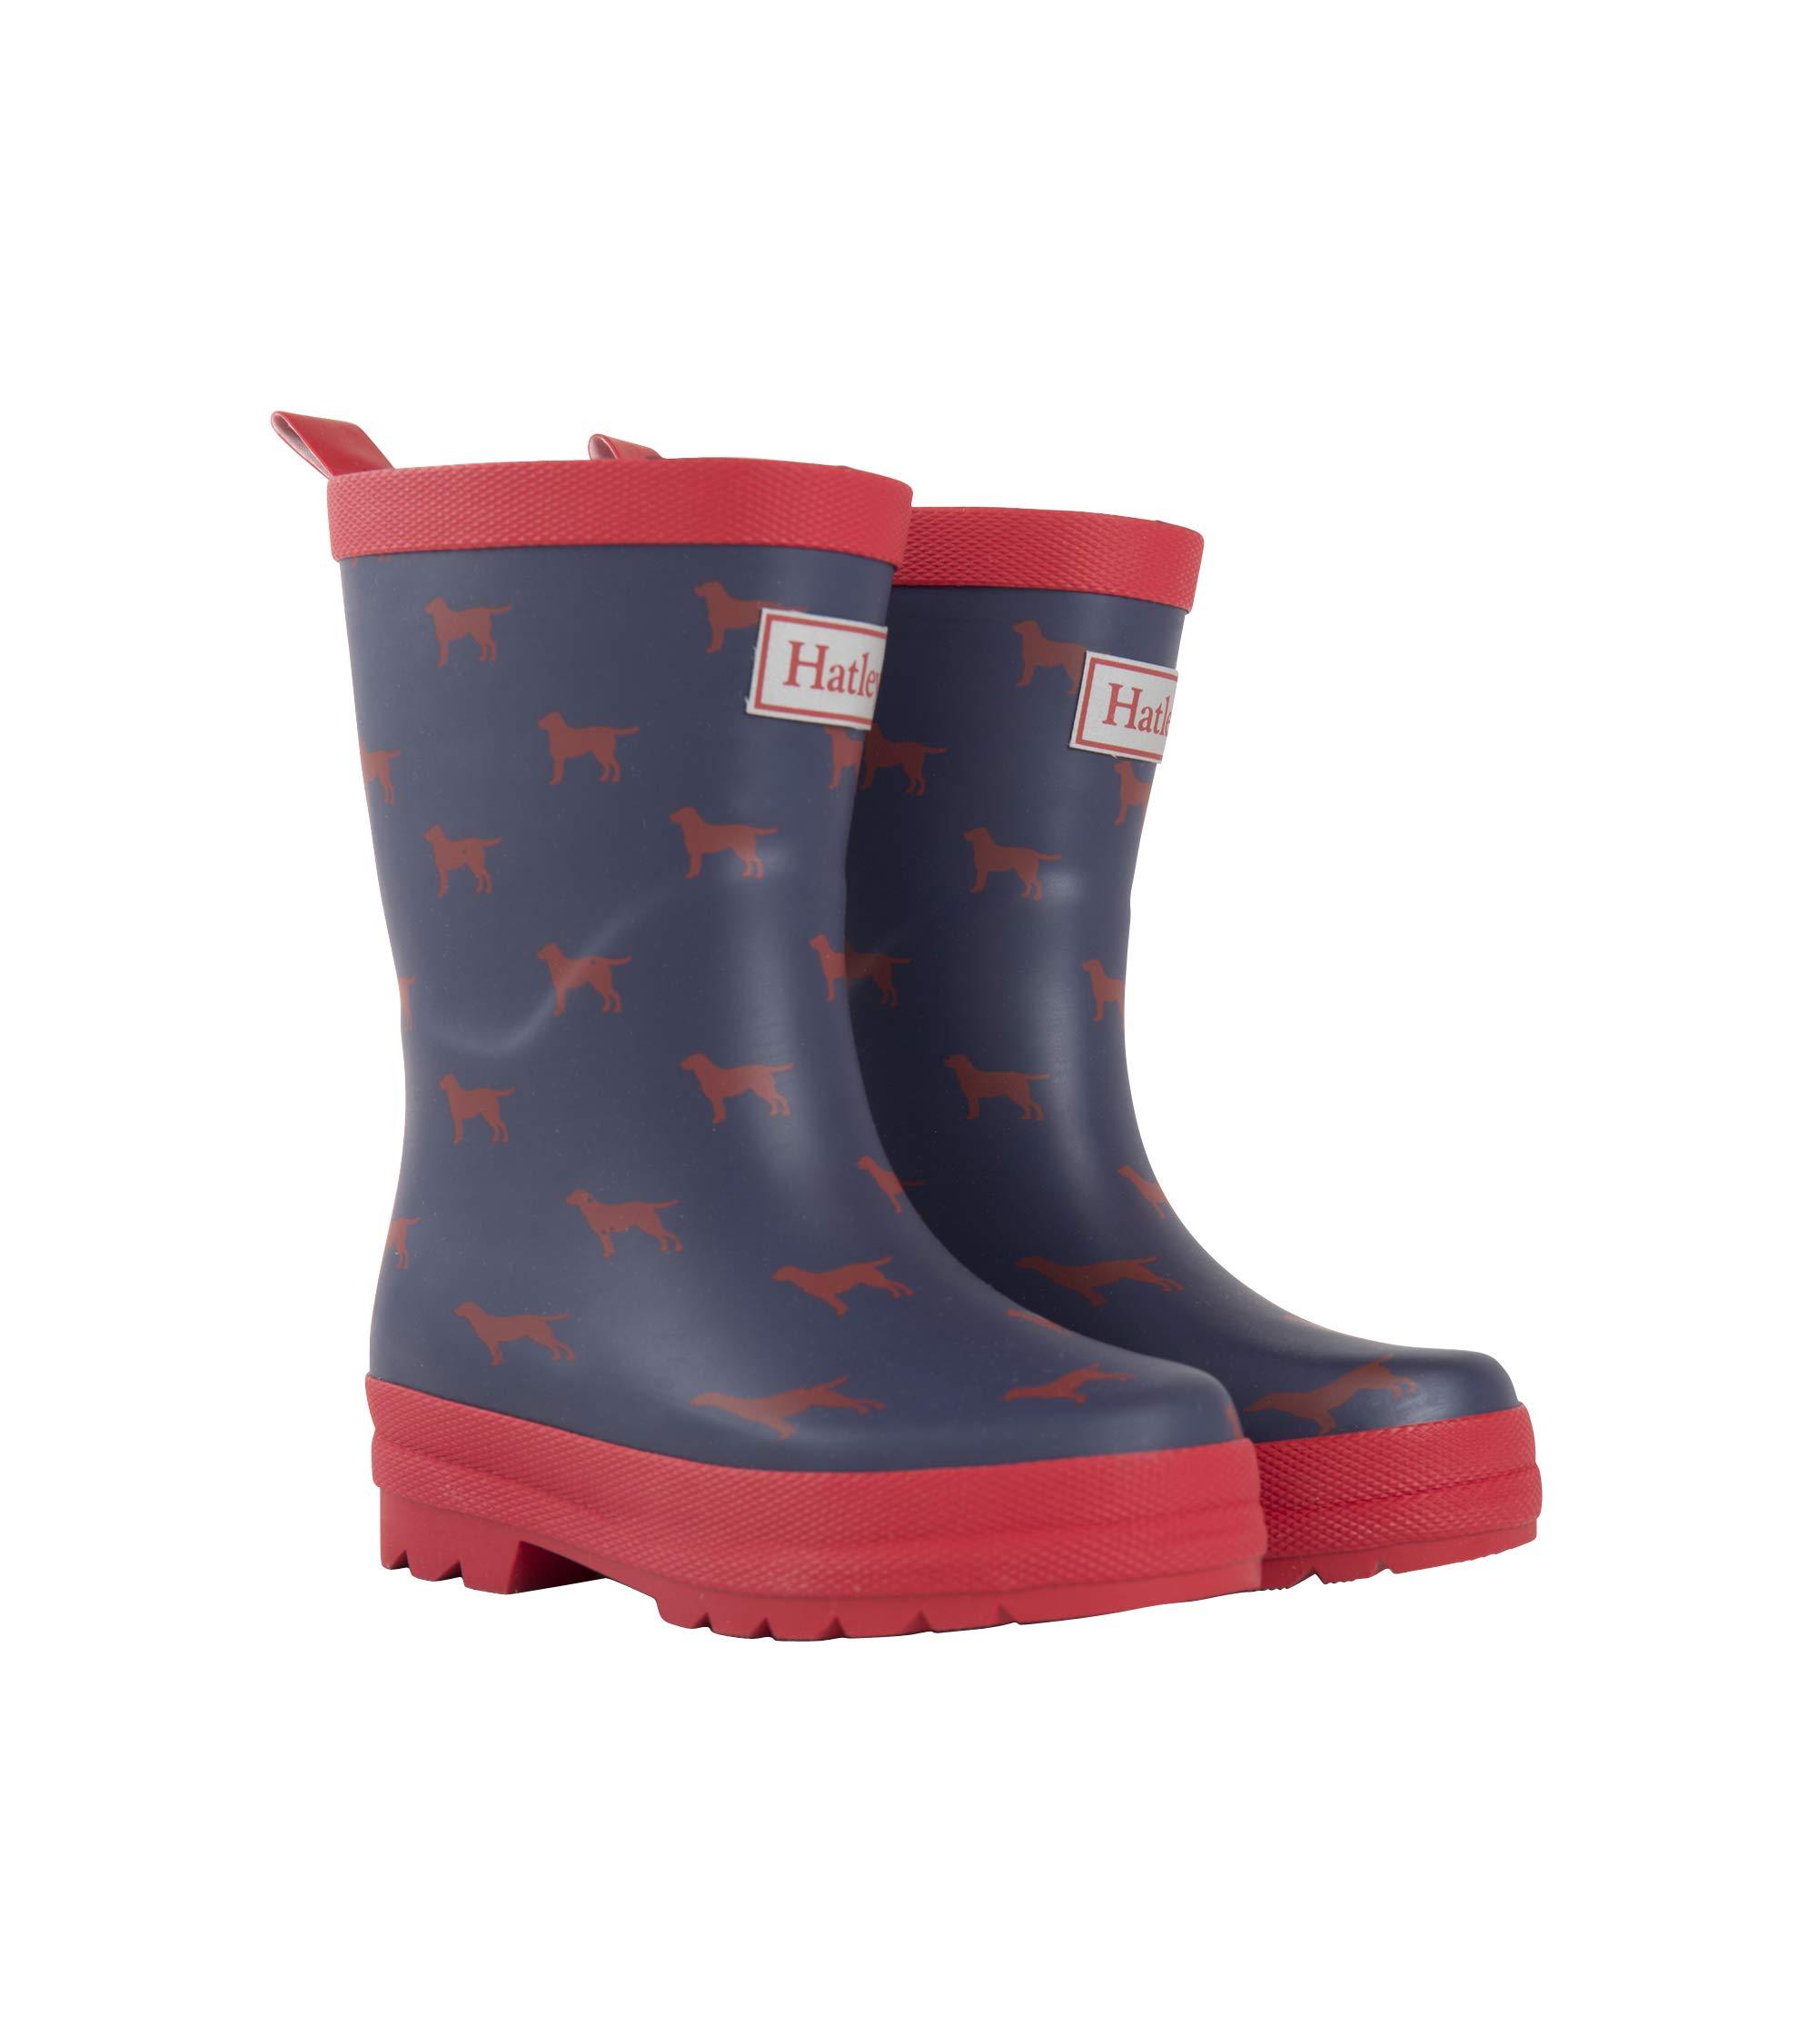 Hatley Boys' Printed Rain Boots Raincoat Red Labs 9 US Child